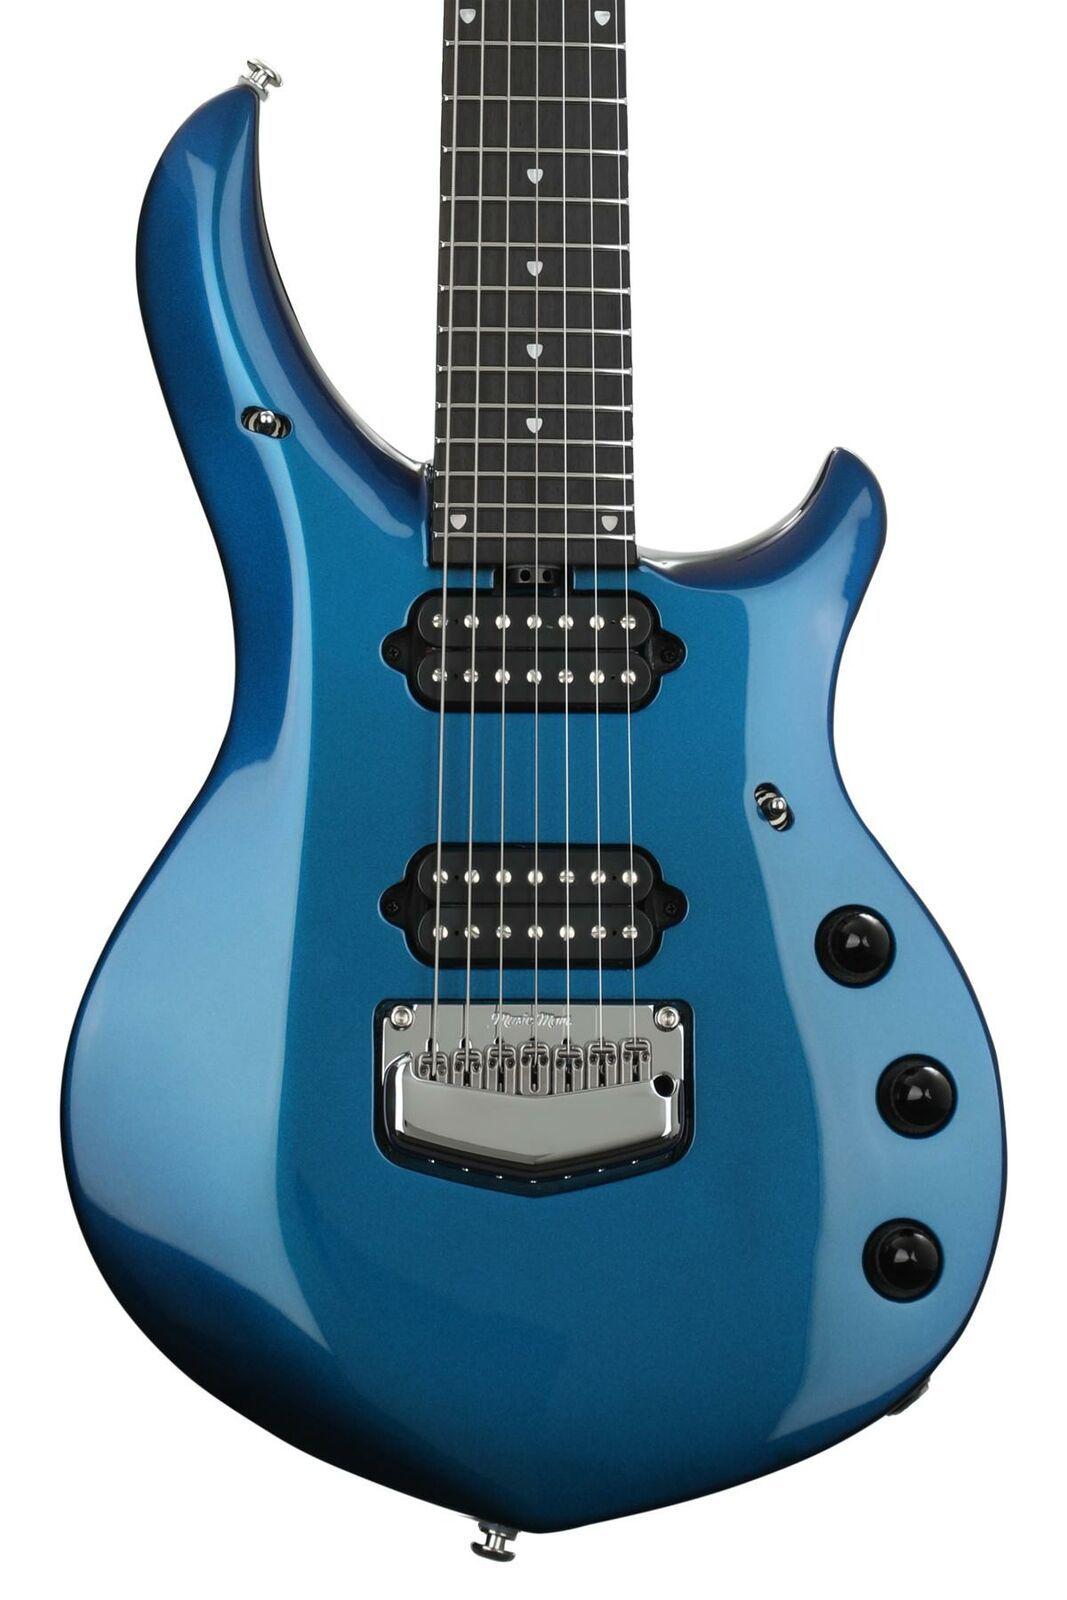 Ernie Ball Music Man John Petrucci Majesty 7 Electric Guitar Kinetic Blue Electric Guitar Guitar Guitar Online